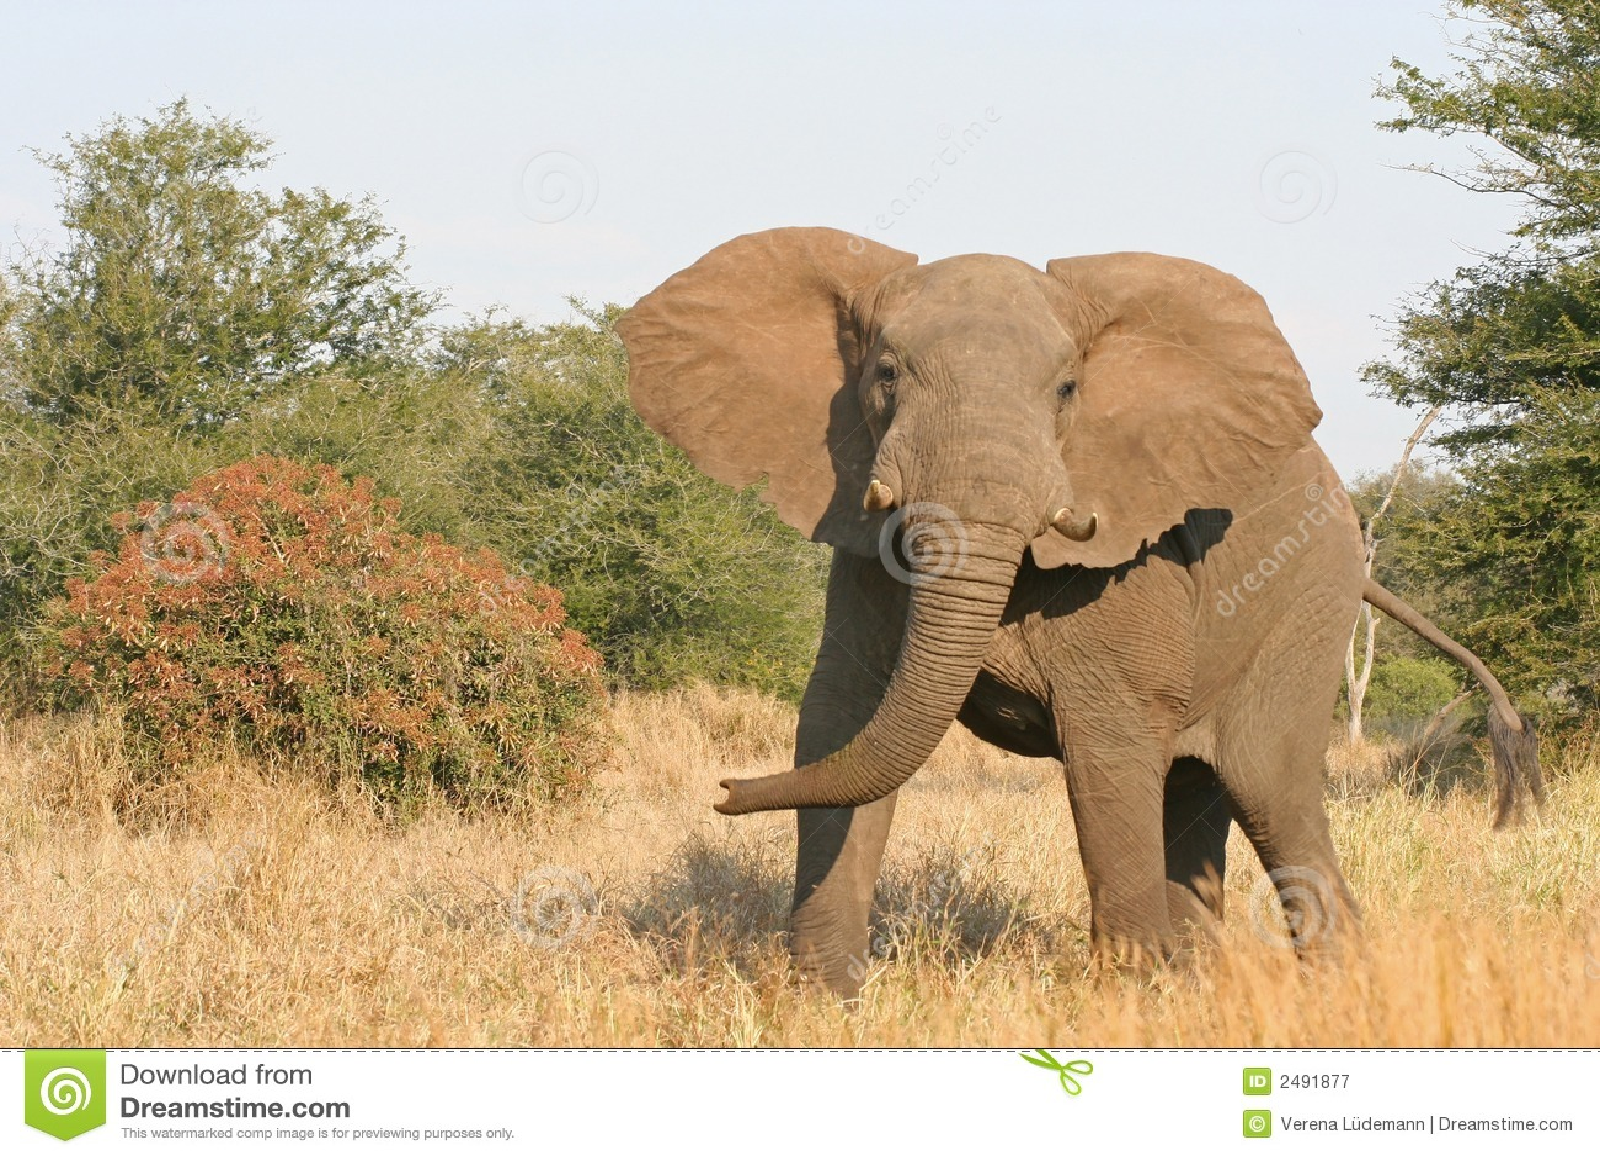 charging elephant stock image image of fauna bull